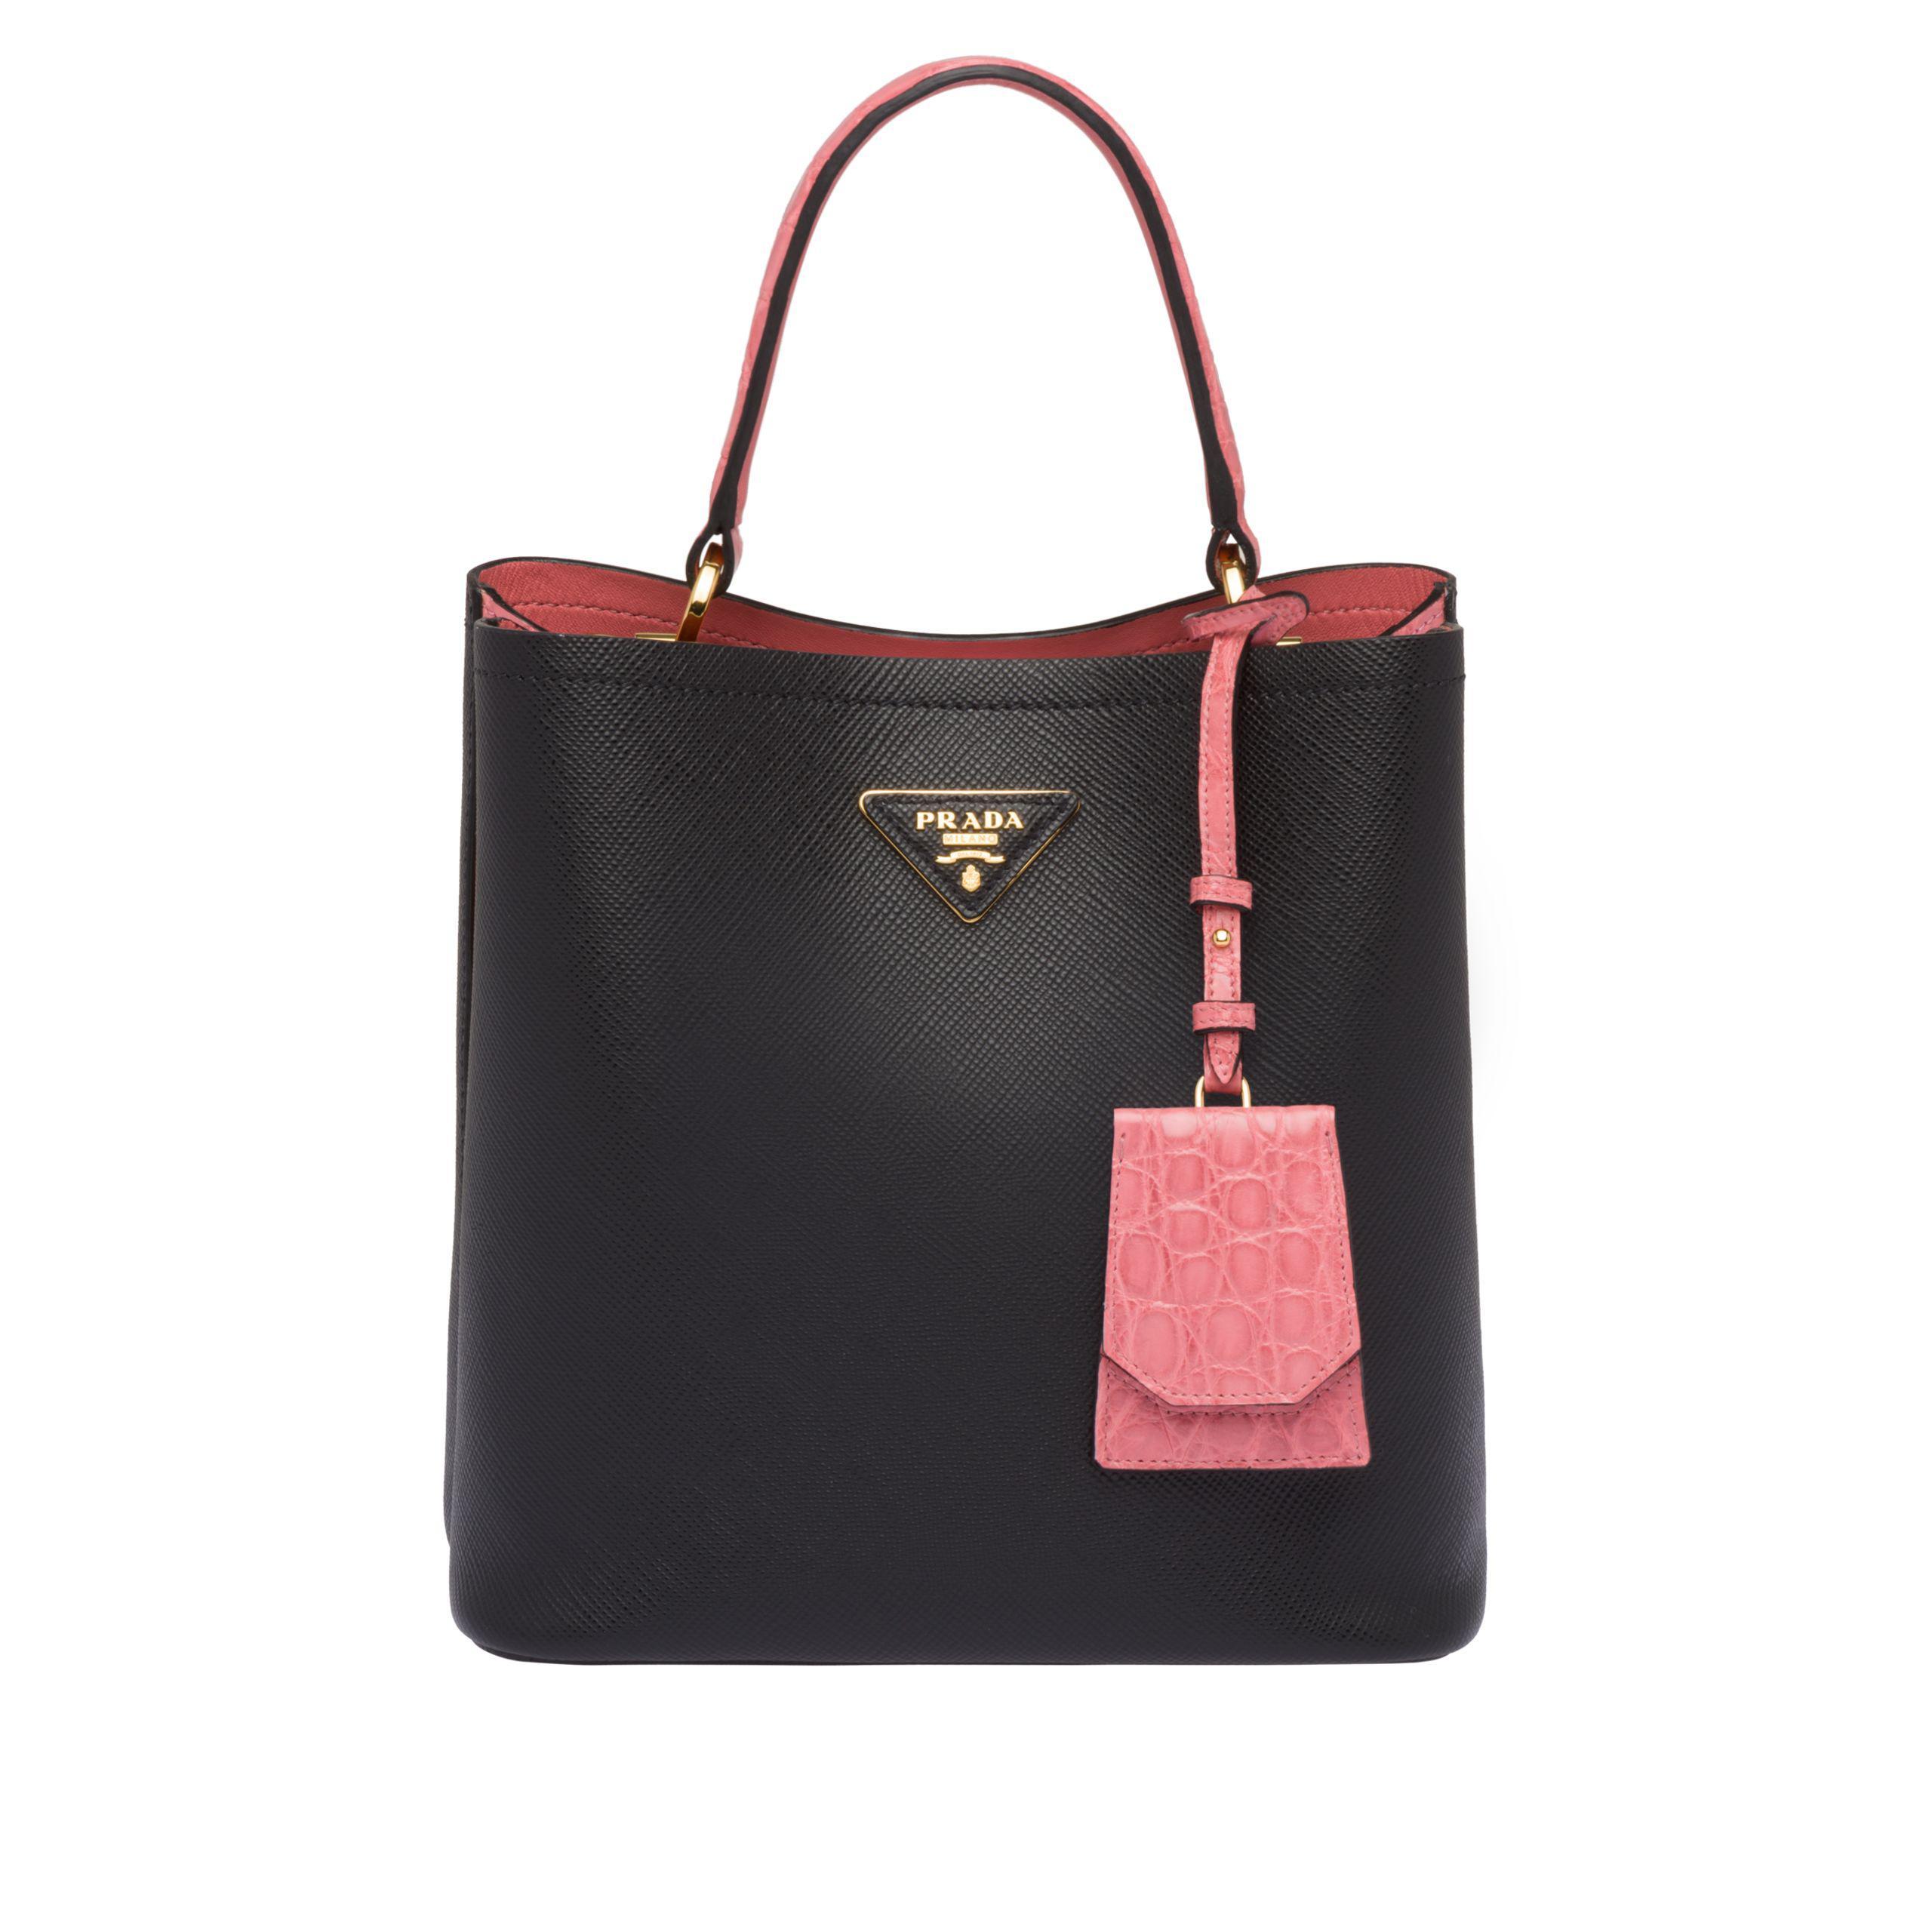 067e23437f0 Prada - Black Double Saffiano Leather Bag - Lyst. View fullscreen